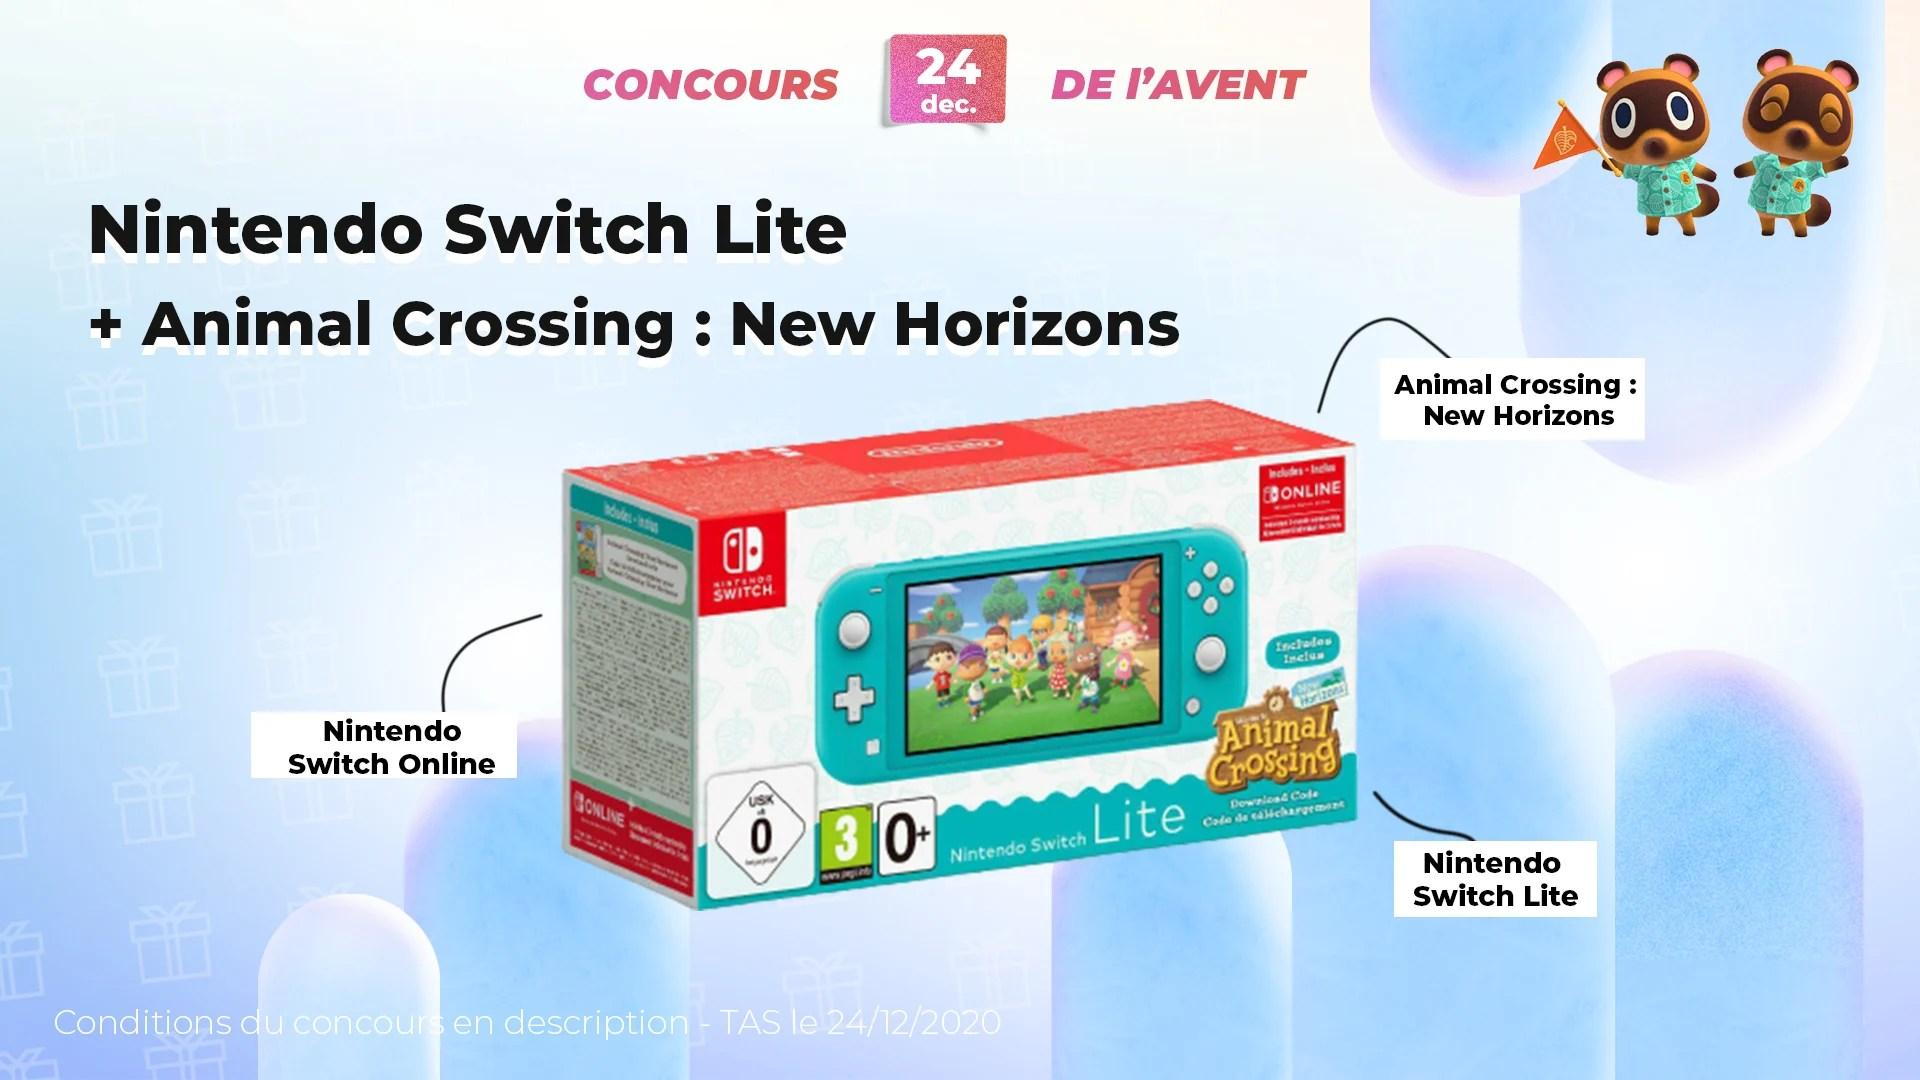 #FrandroidOffreMoi une Nintendo Switch Lite et Animal Crossing